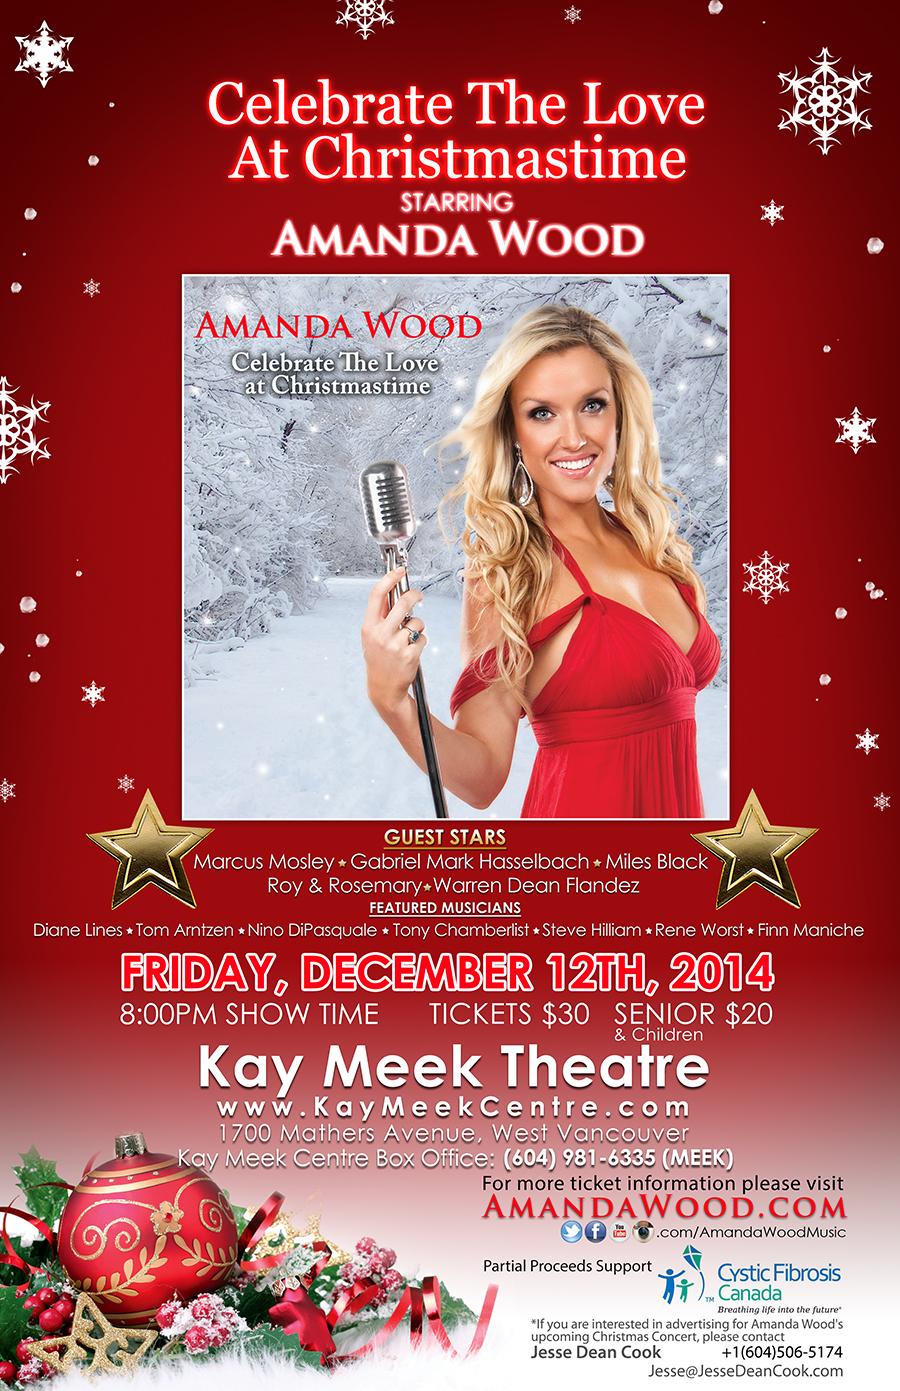 PRESS RELEASE: Amanda Wood Charity Concert For Cystic Fibrosis Dec. 12th